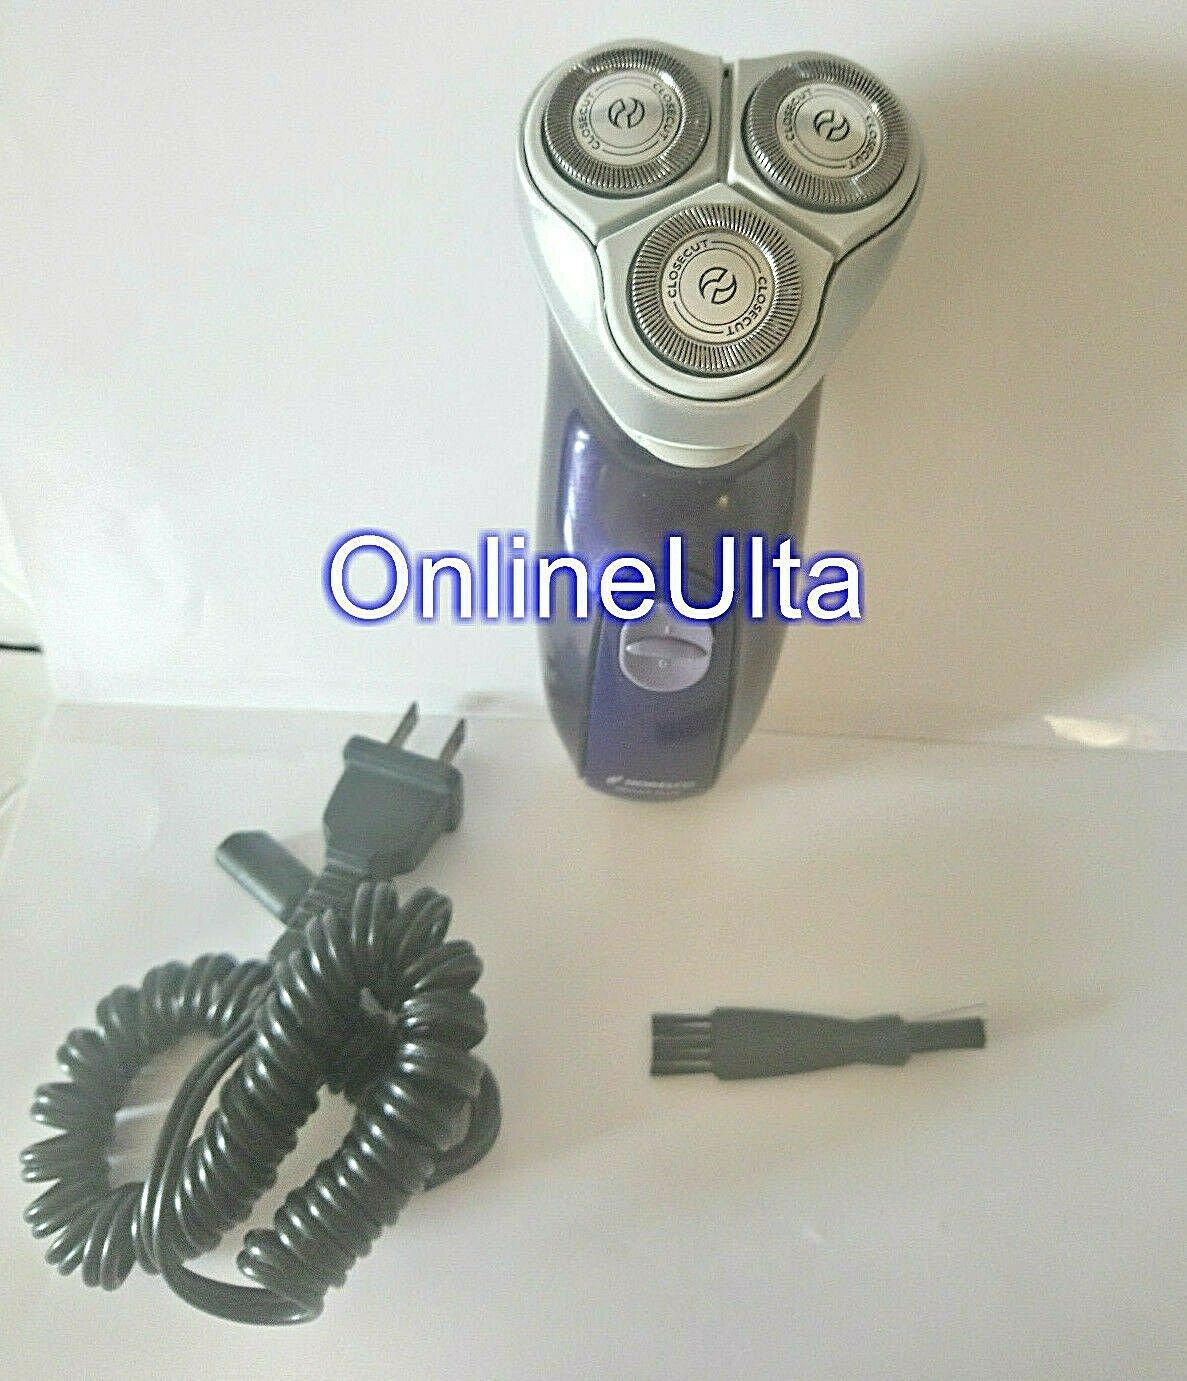 Philips Norelco 6423XL Quadra Action Men's Shaver trimmer corded Close cut